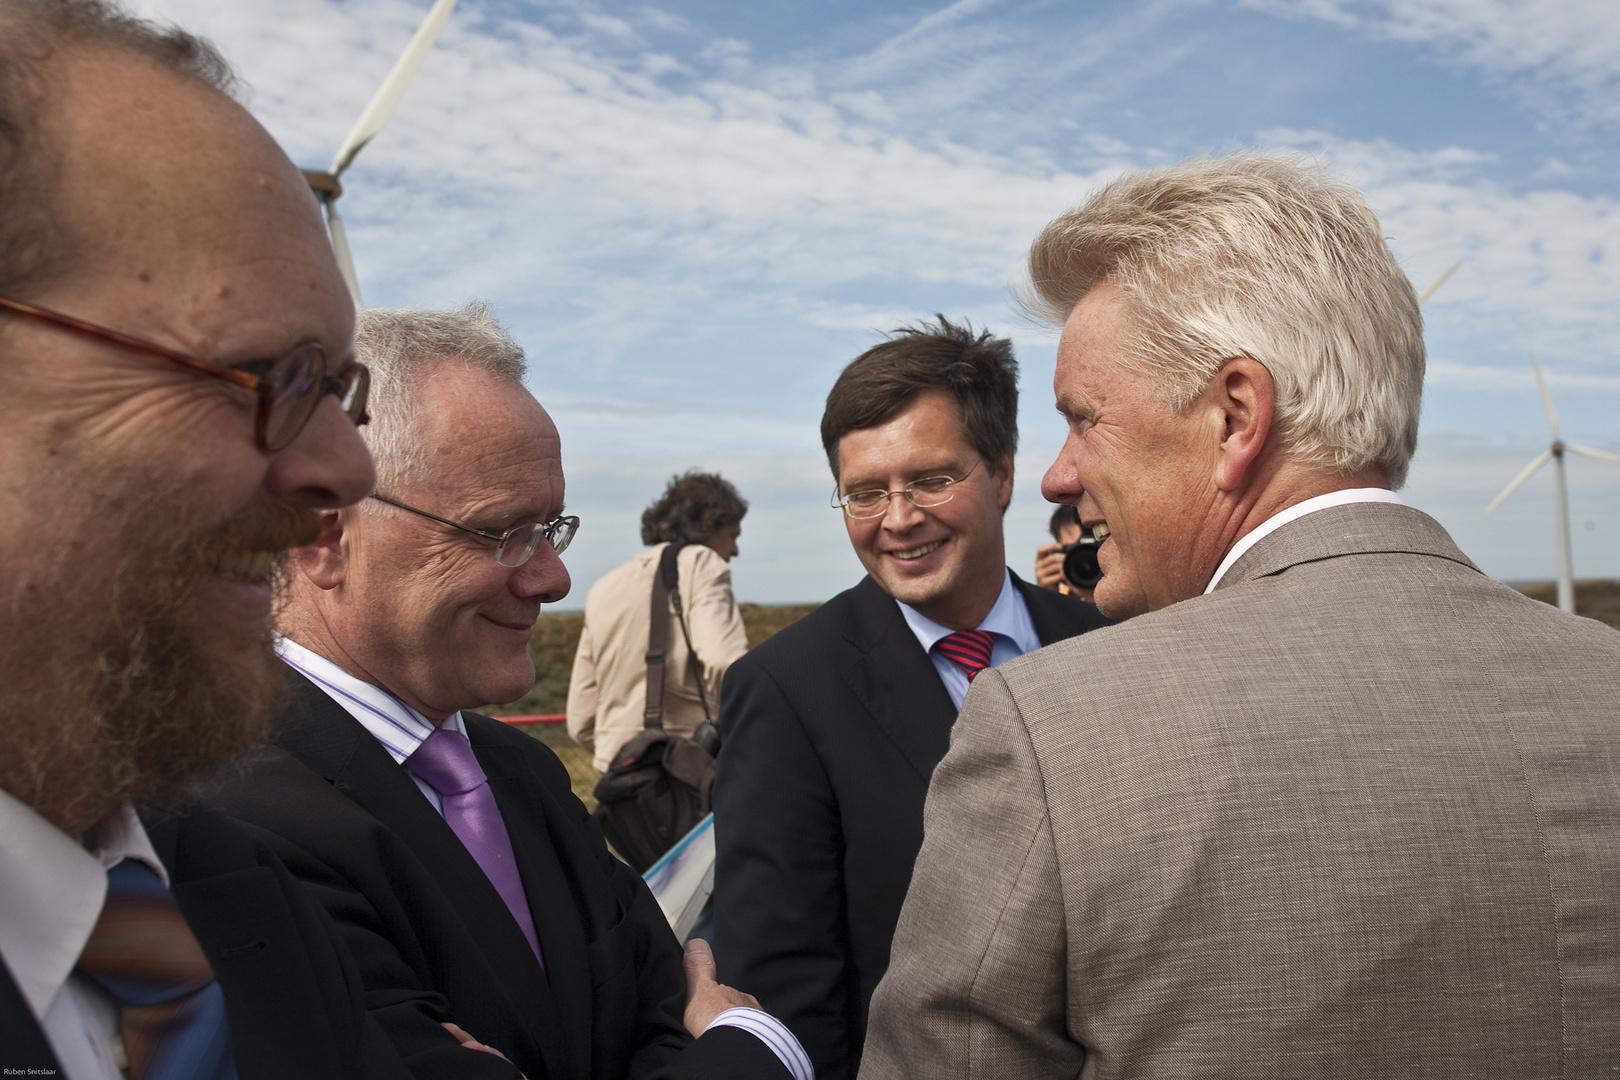 Dutch Prime Minister 2010